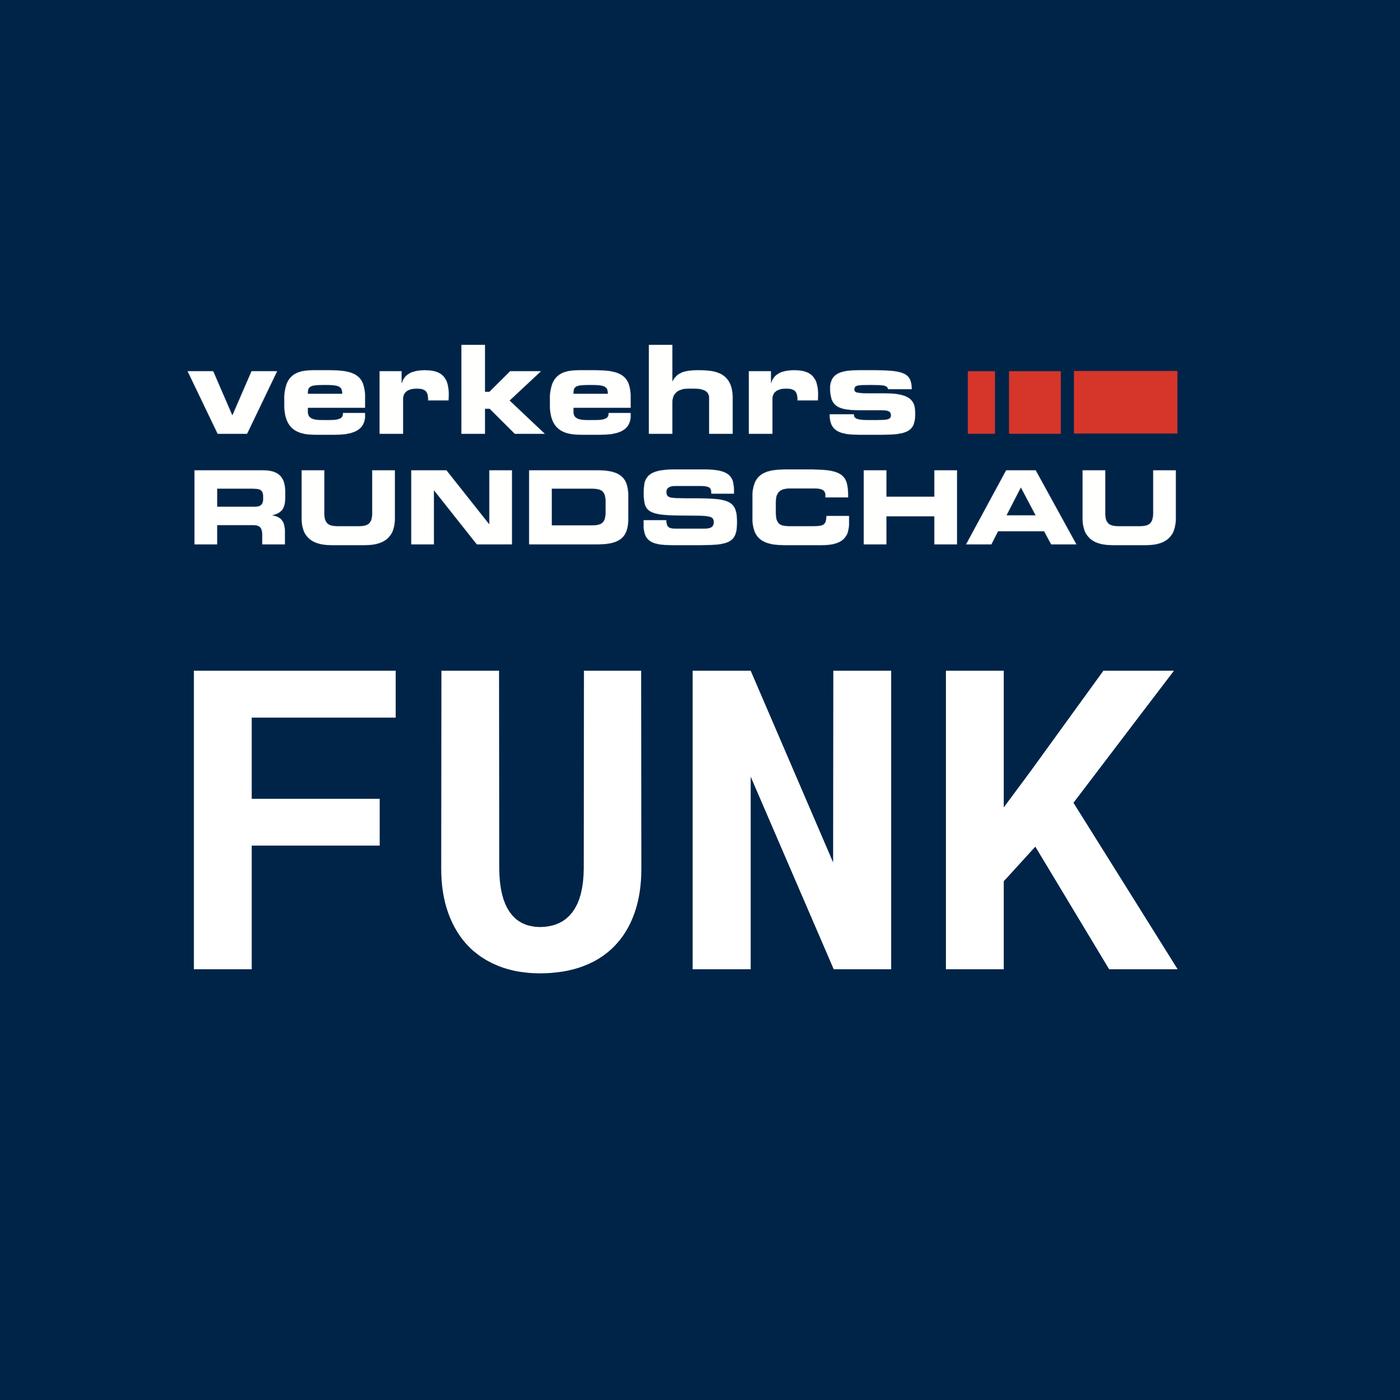 VerkehrsRundschau Funk